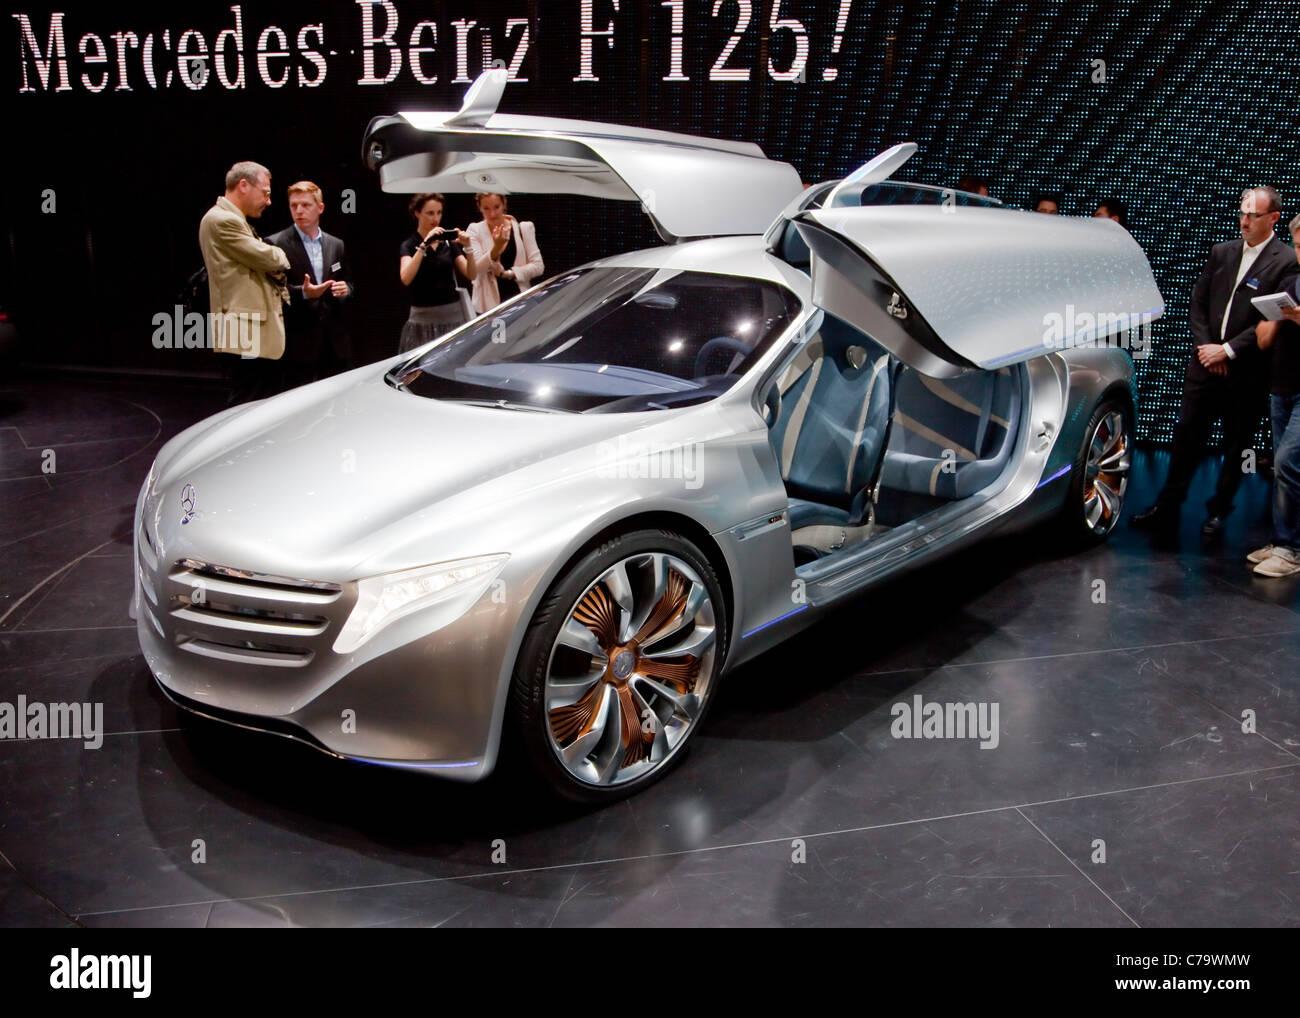 New Mercedes Benz Concept Car F125 on the IAA 2011 International Motor Show Frankfurt, Germany - Stock Image